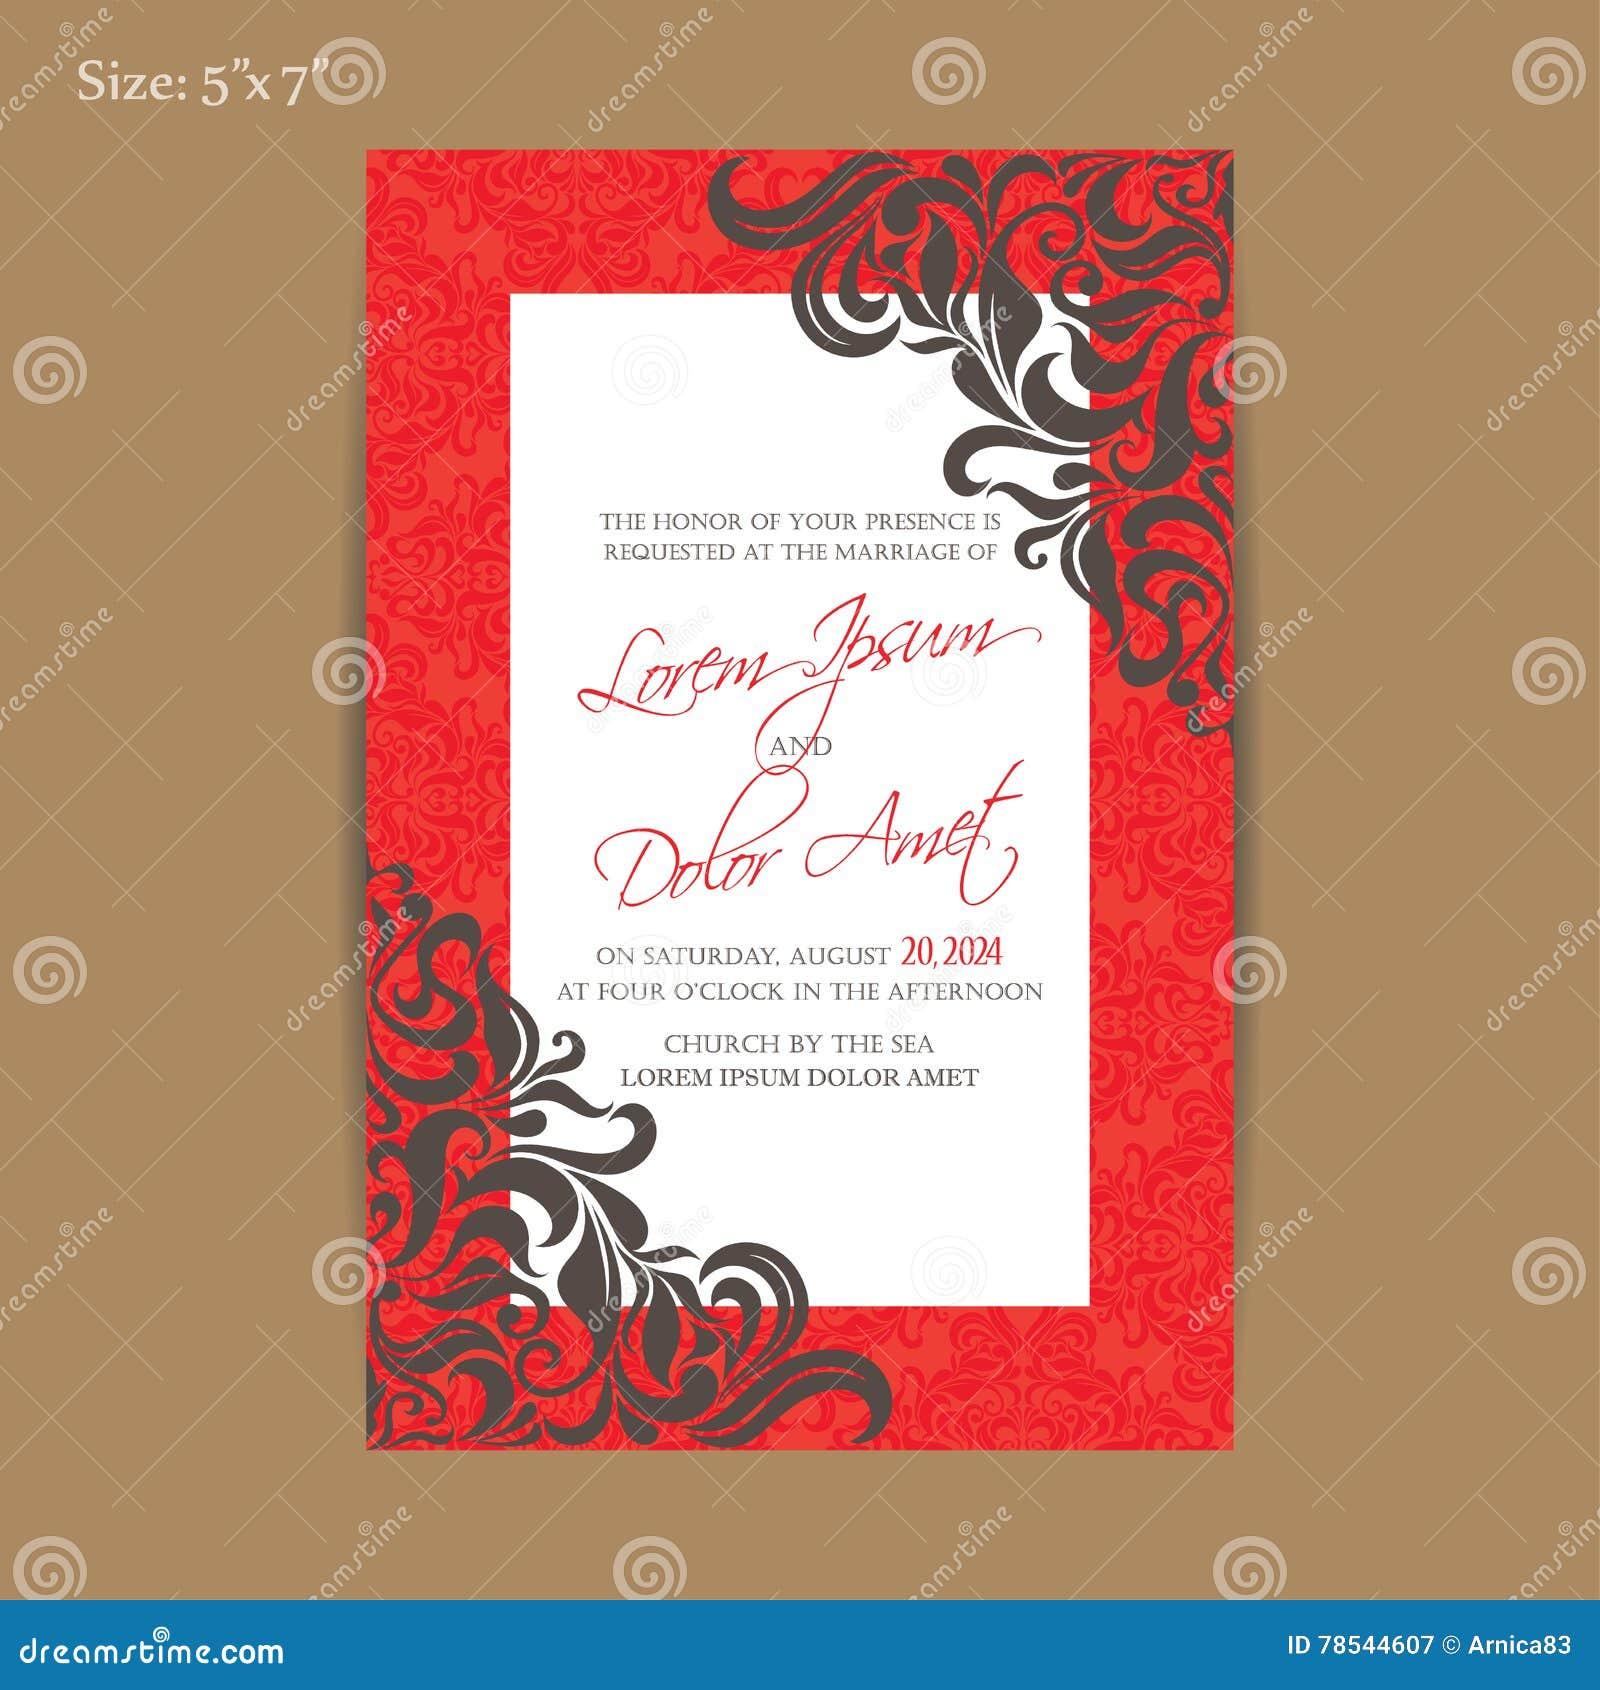 Luxury Vintage Wedding Invitation Card Stock Vector - Illustration ...